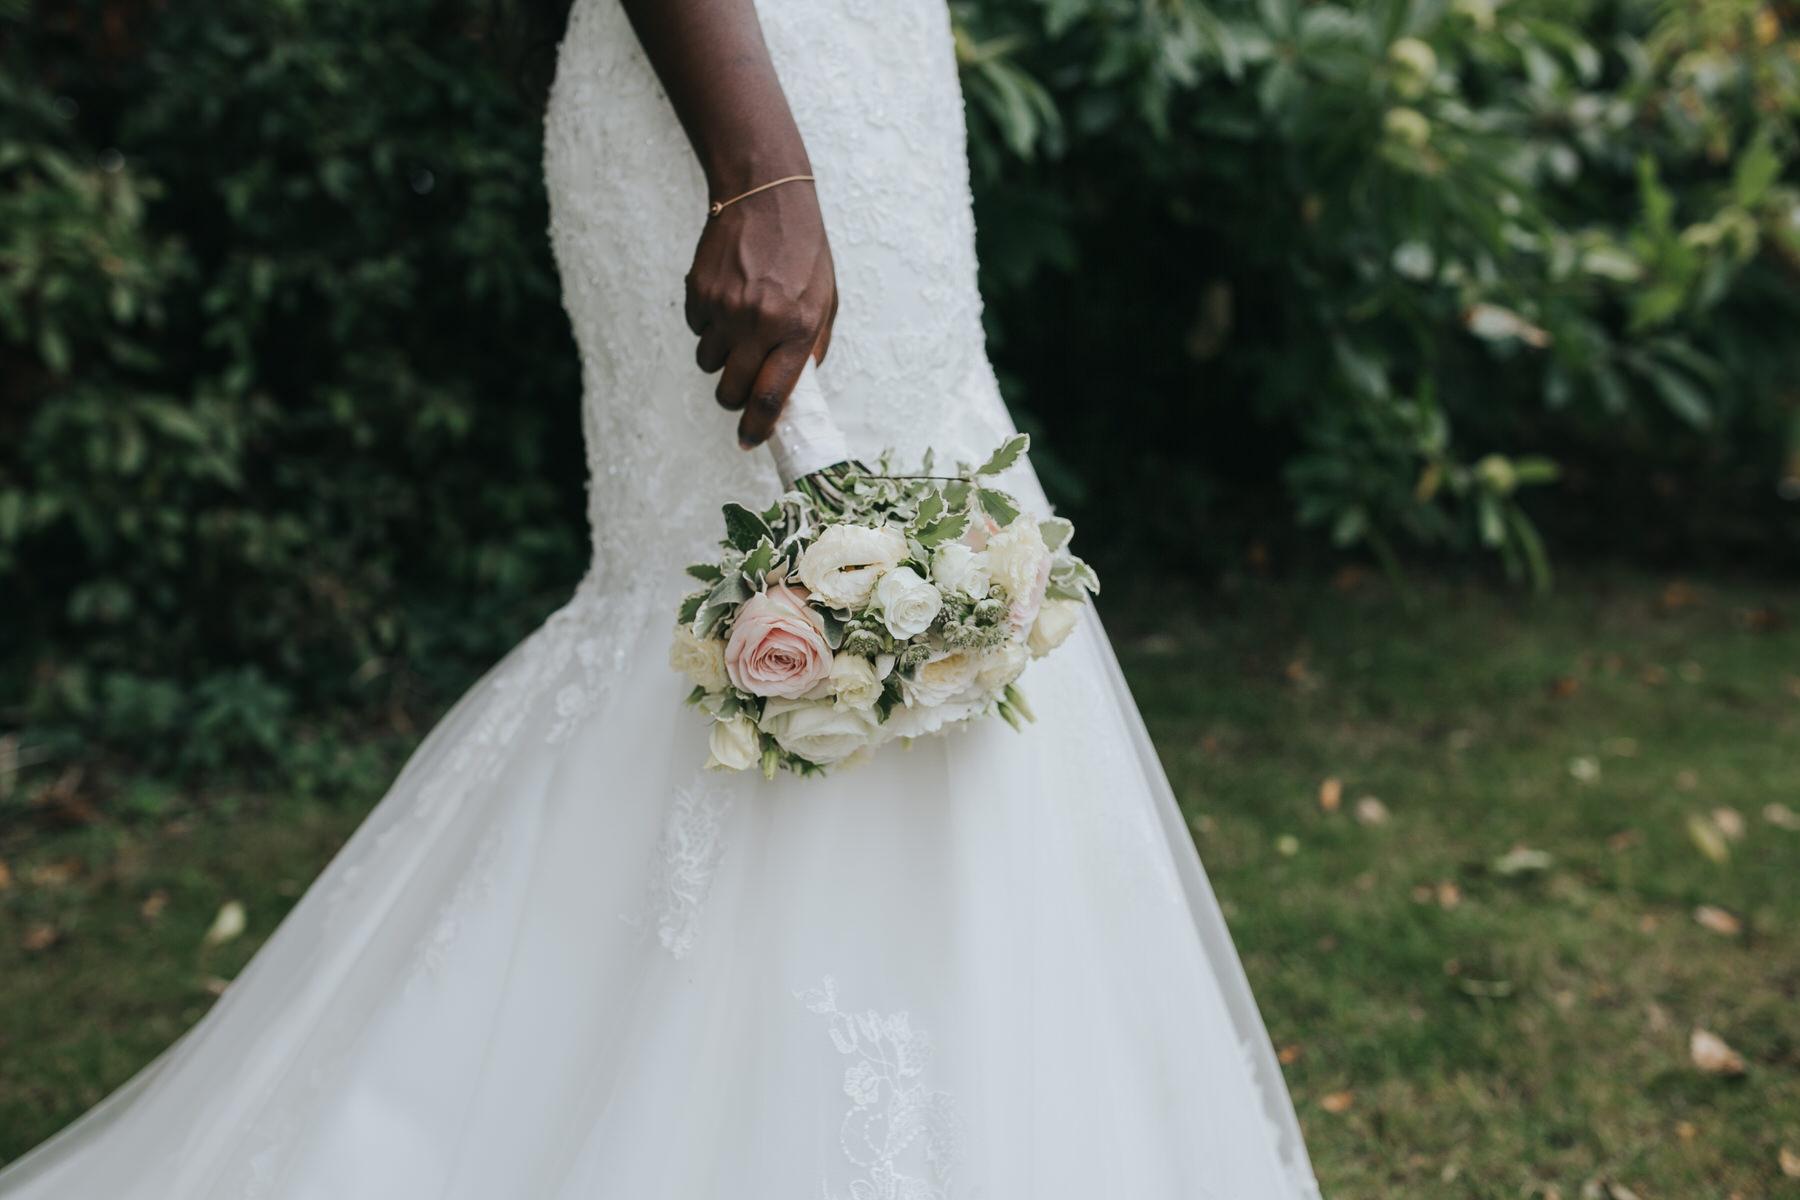 195 bride holding bouquet during wedding portraits.jpg